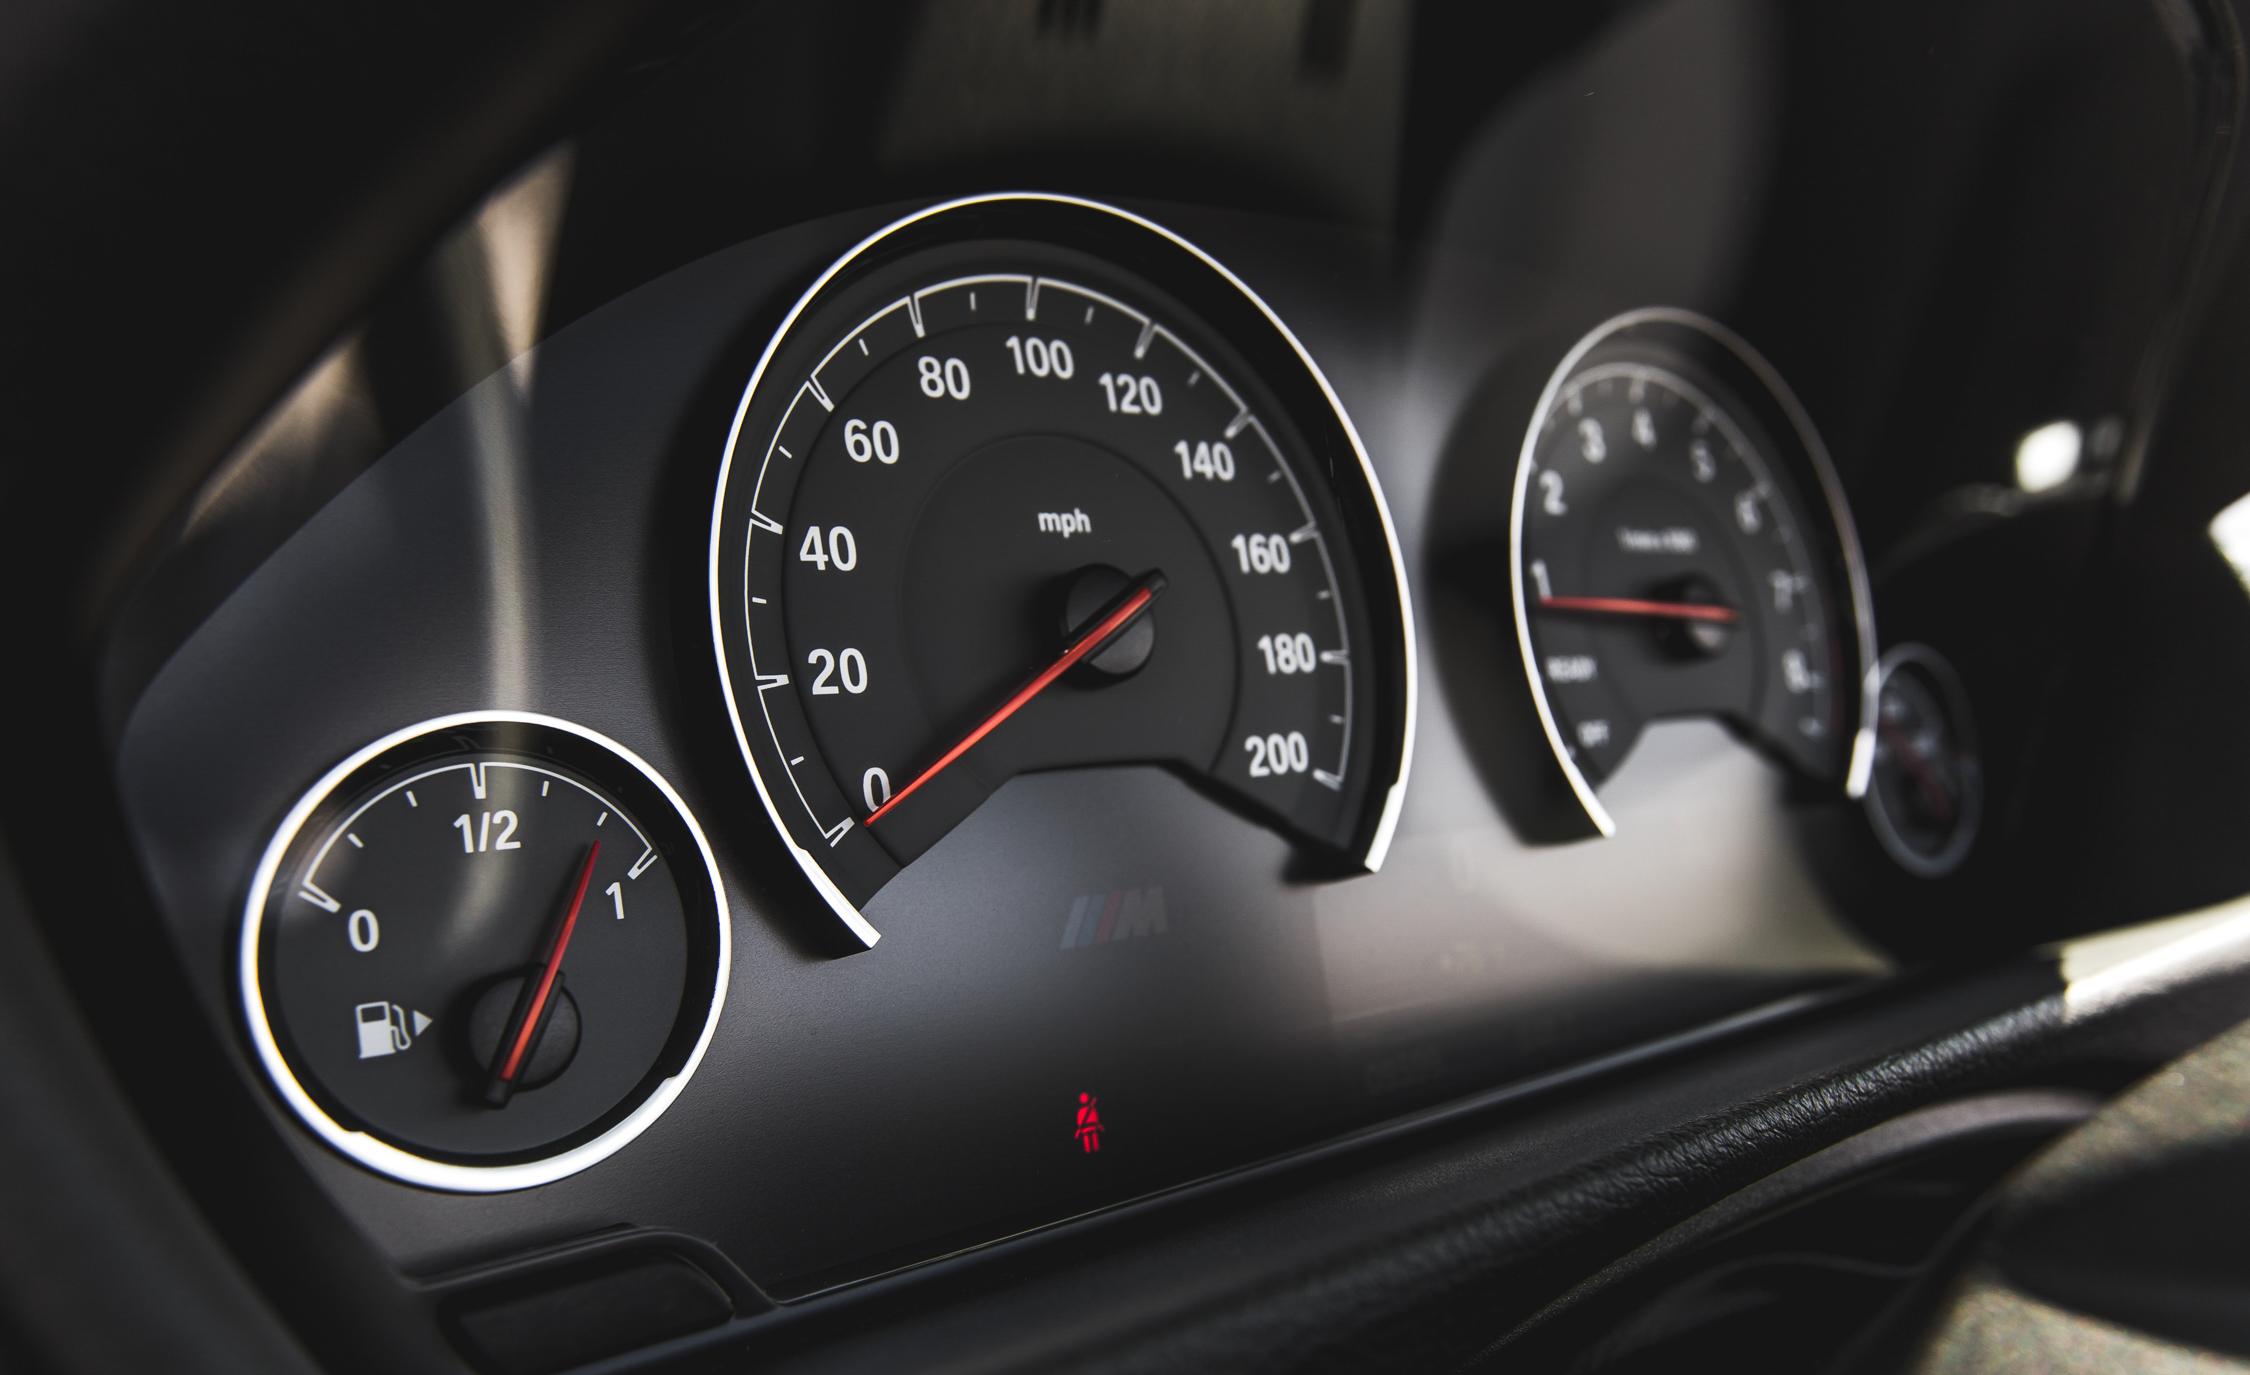 2015 BMW M4 Convertible Interior Speedometer